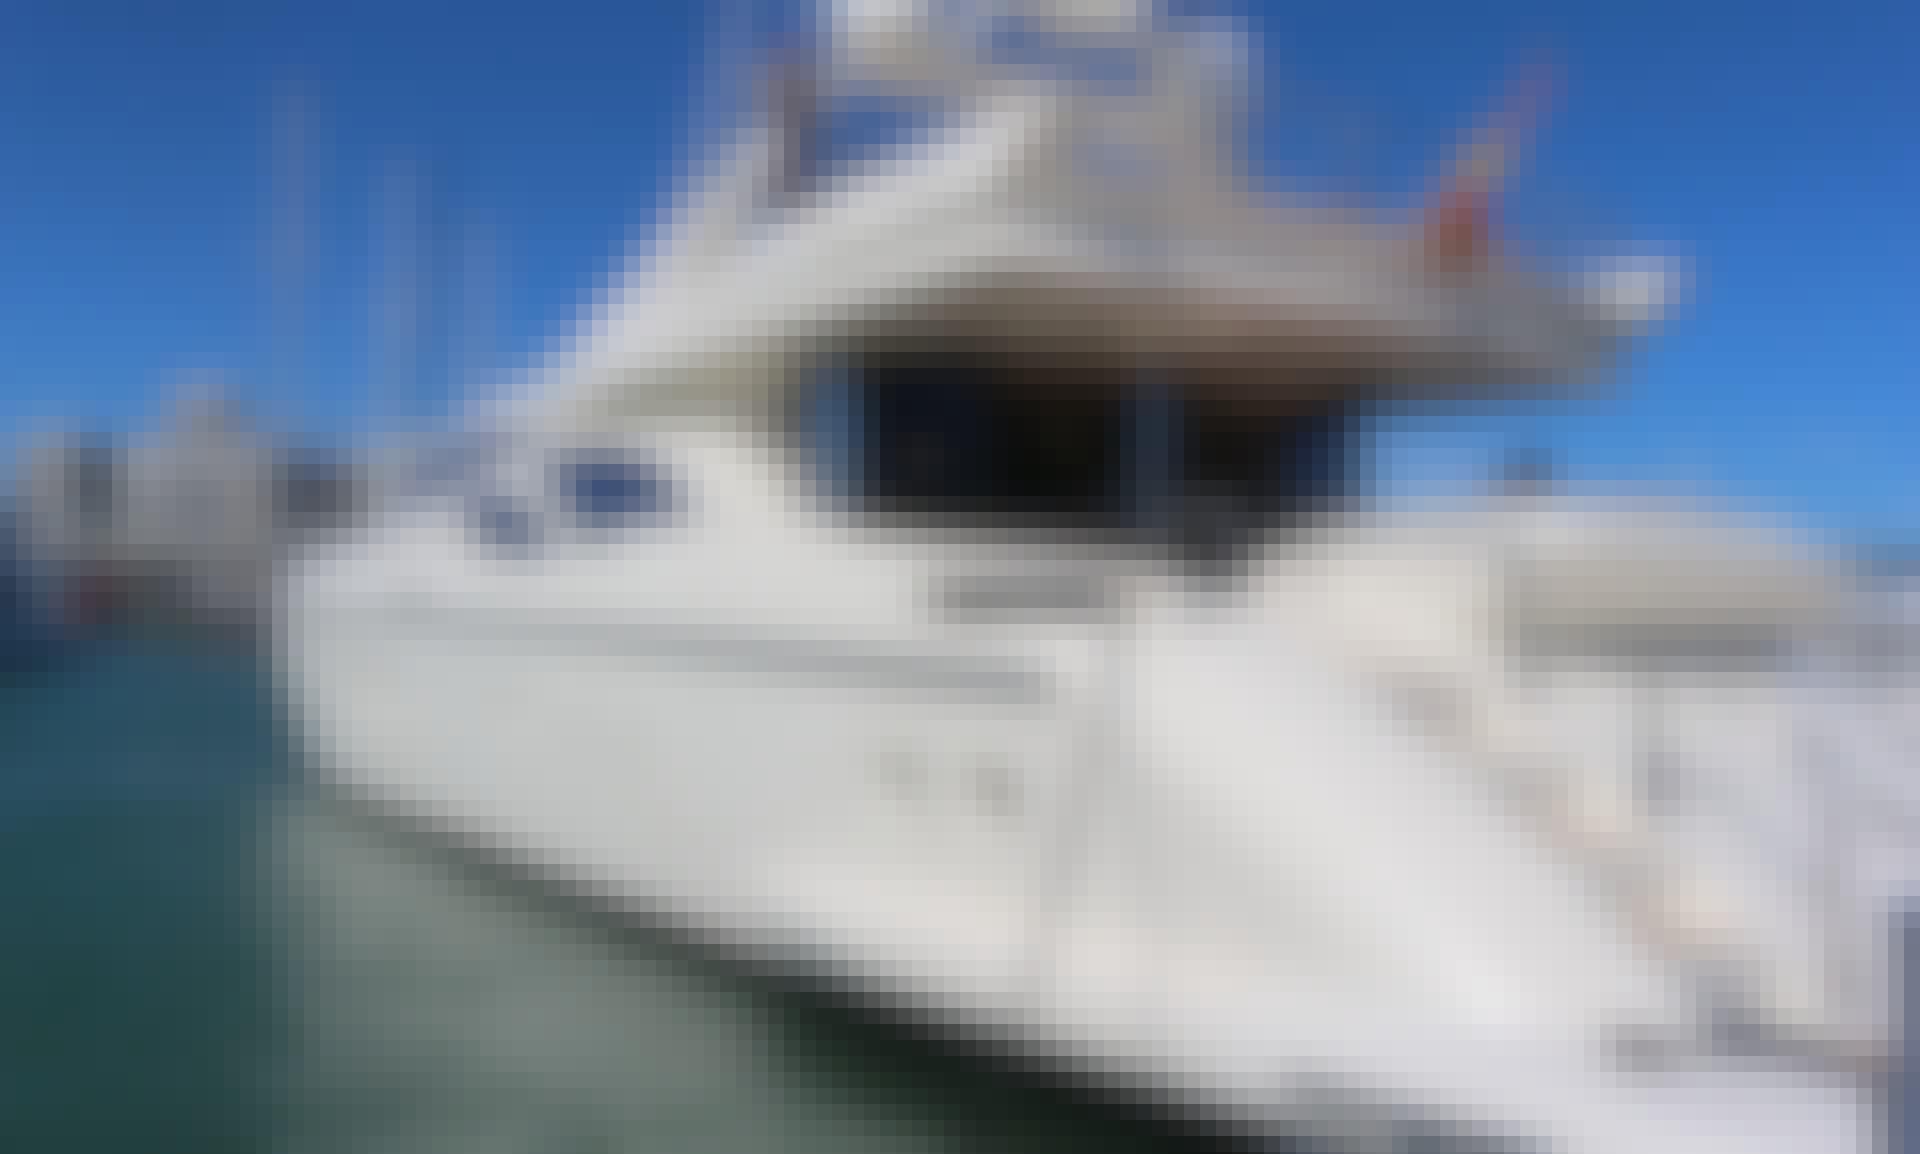 Azimut 98 Leonardo Yacht Charter in Cabo San Lucas, Mexico